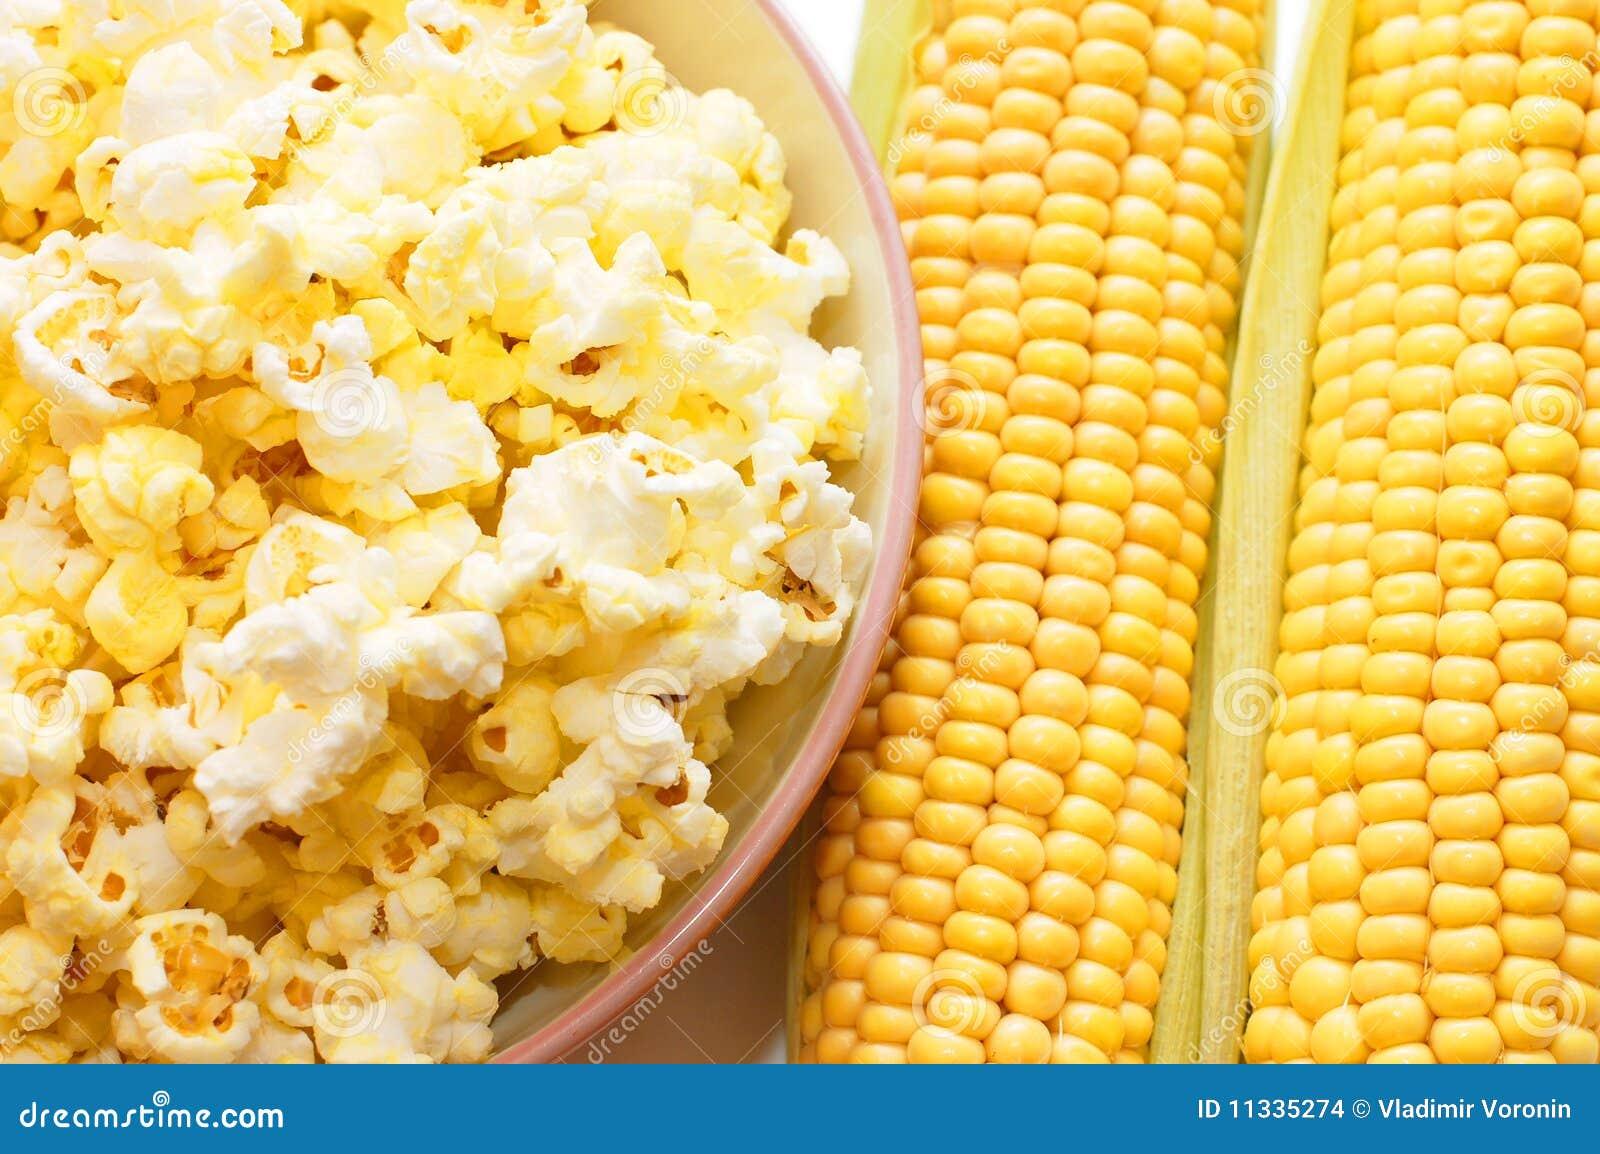 Fresh Corn And Popcorn Stock Images - Image: 11335274